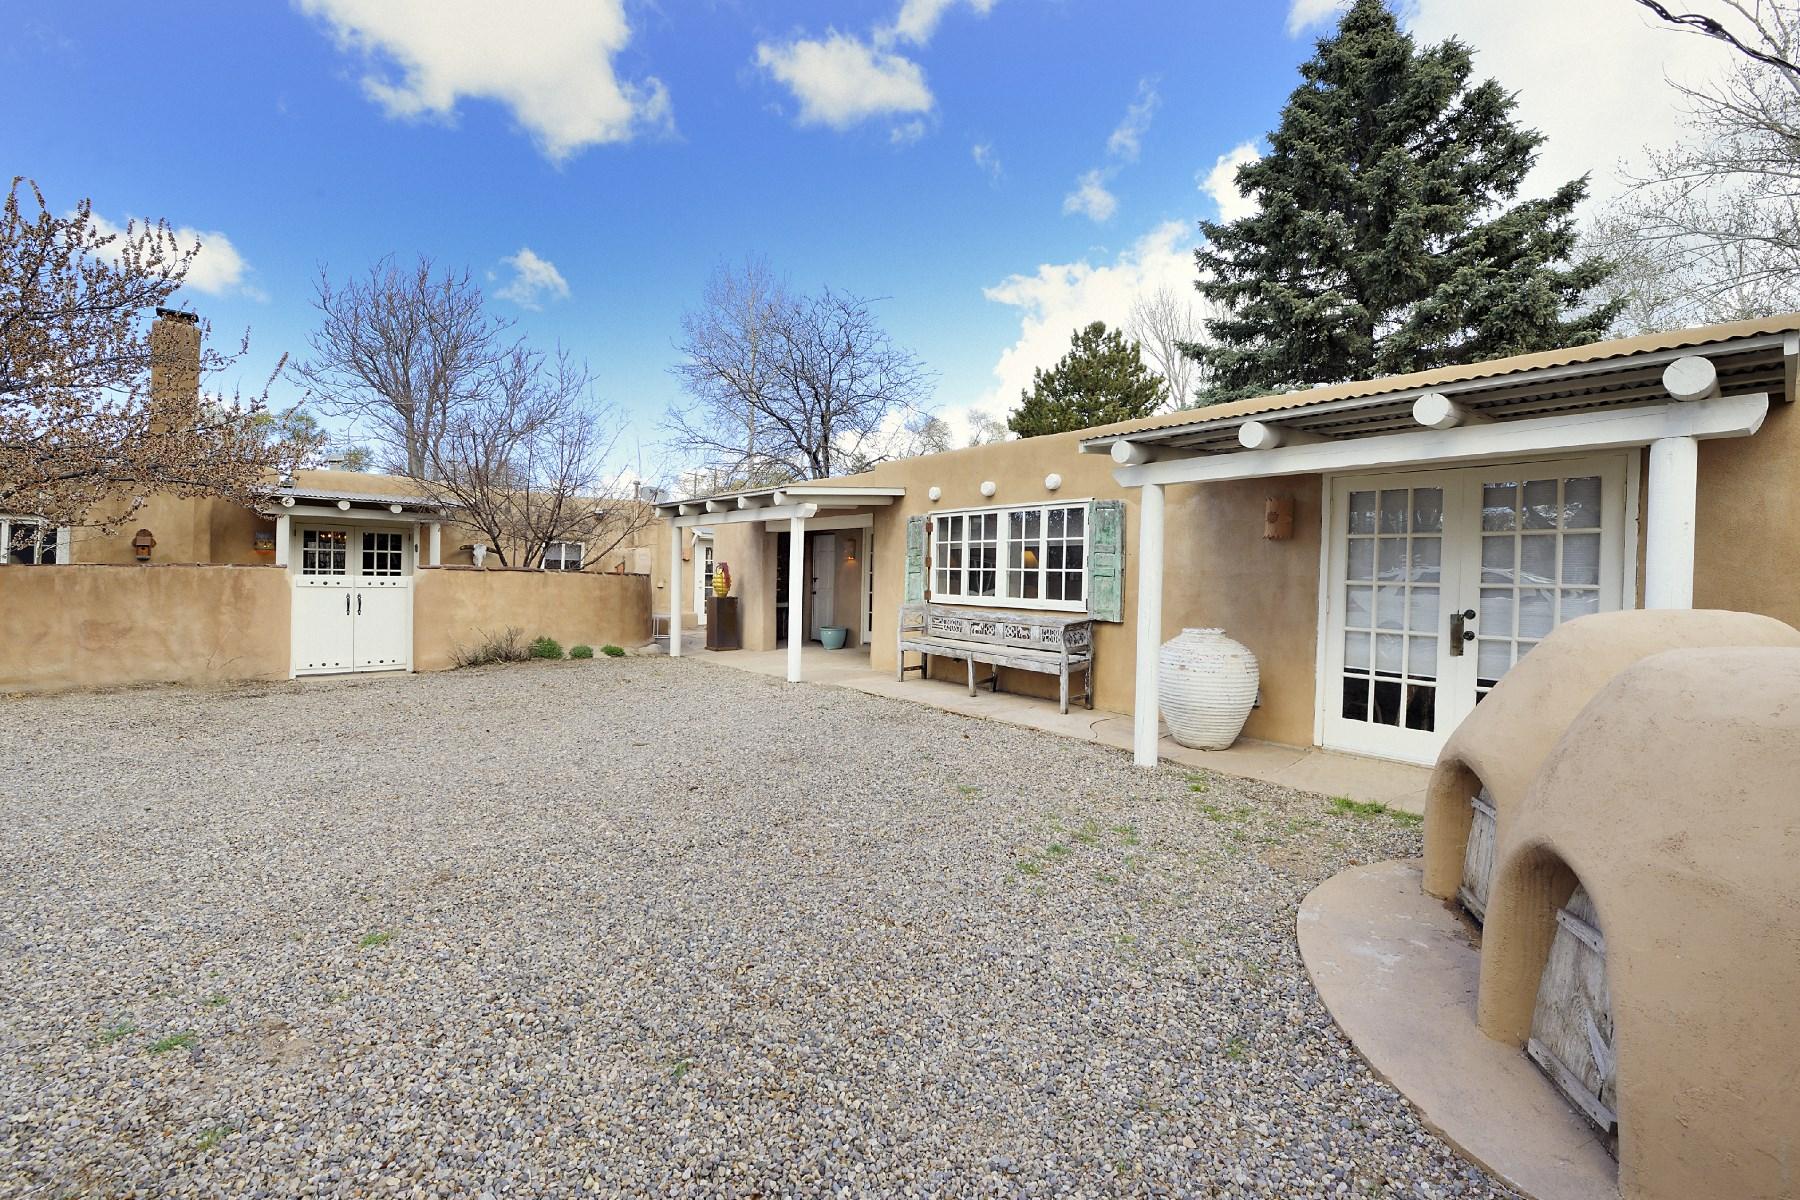 Single Family Home for Sale at 870 E. Alameda Santa Fe, New Mexico, 87501 United States